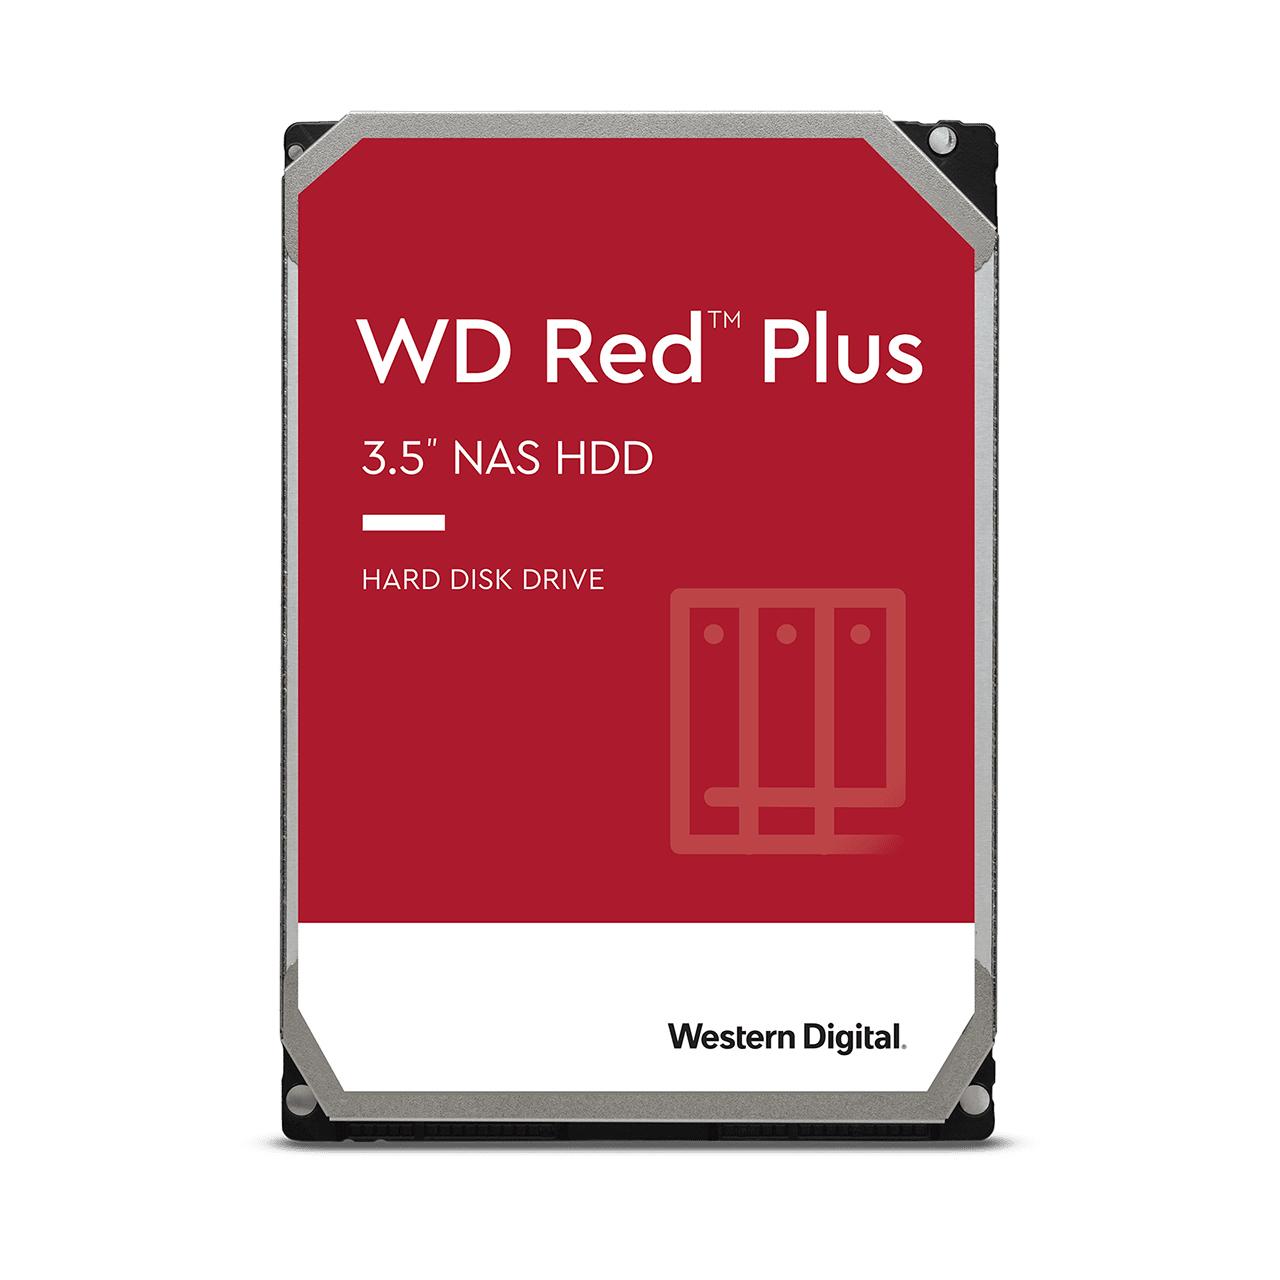 Wd Red Plus 3.5 4000 Gb Serial Ata Iii